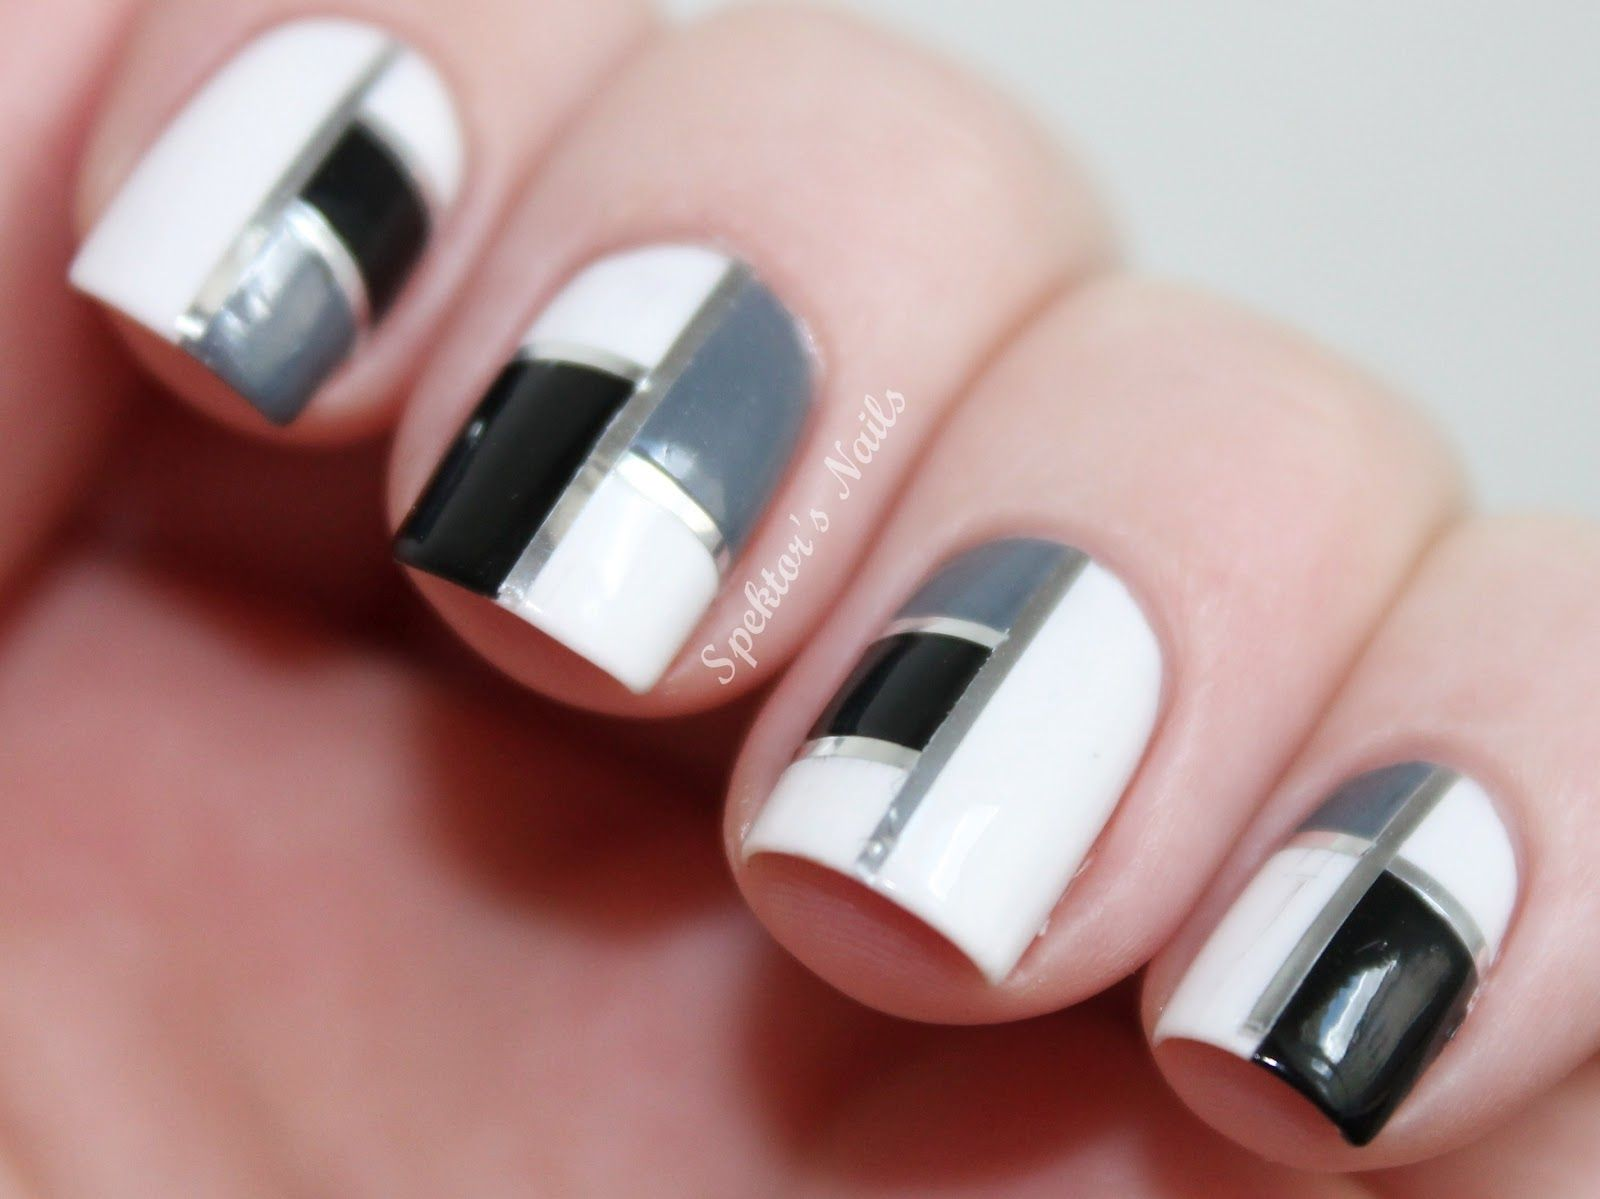 Pin by Lynda Styles on Nail art | Pinterest | Square nail designs ...